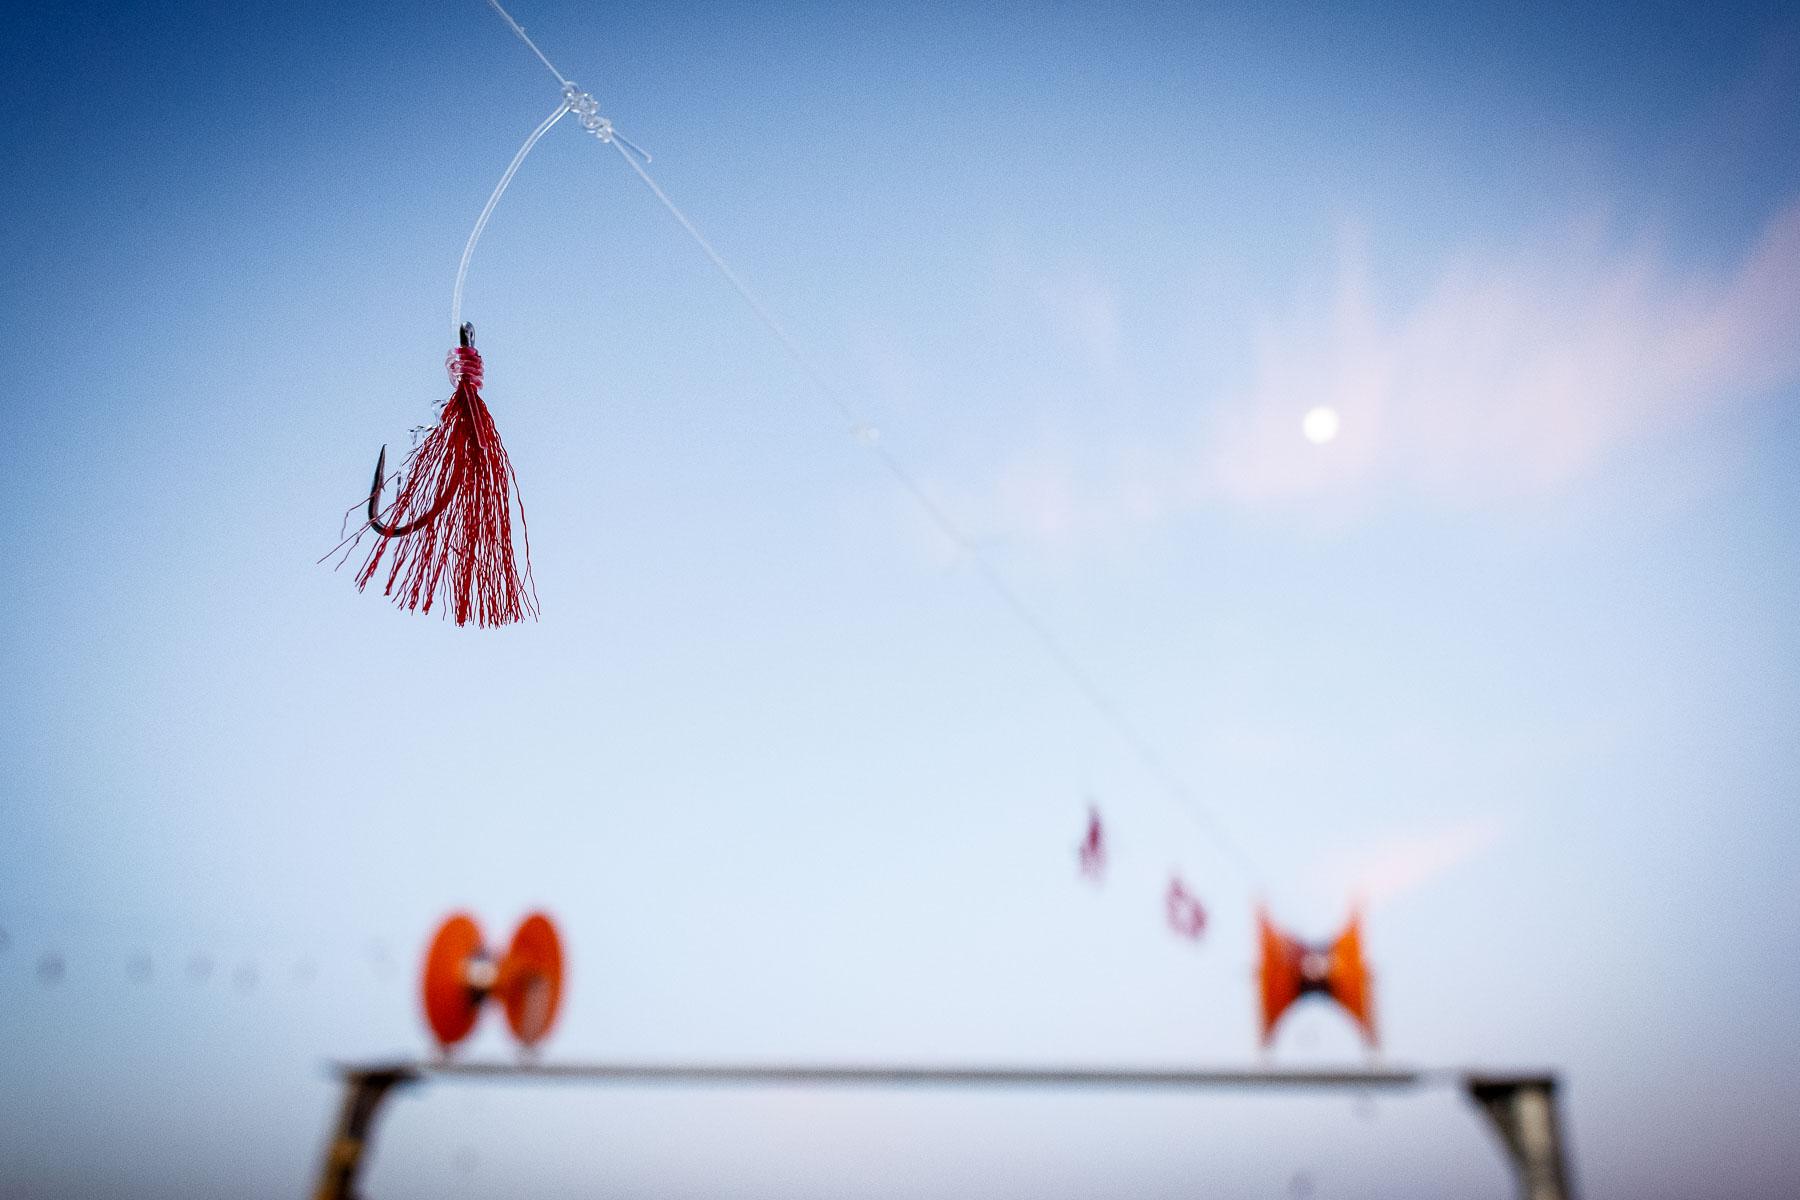 Mackerel jigging moon